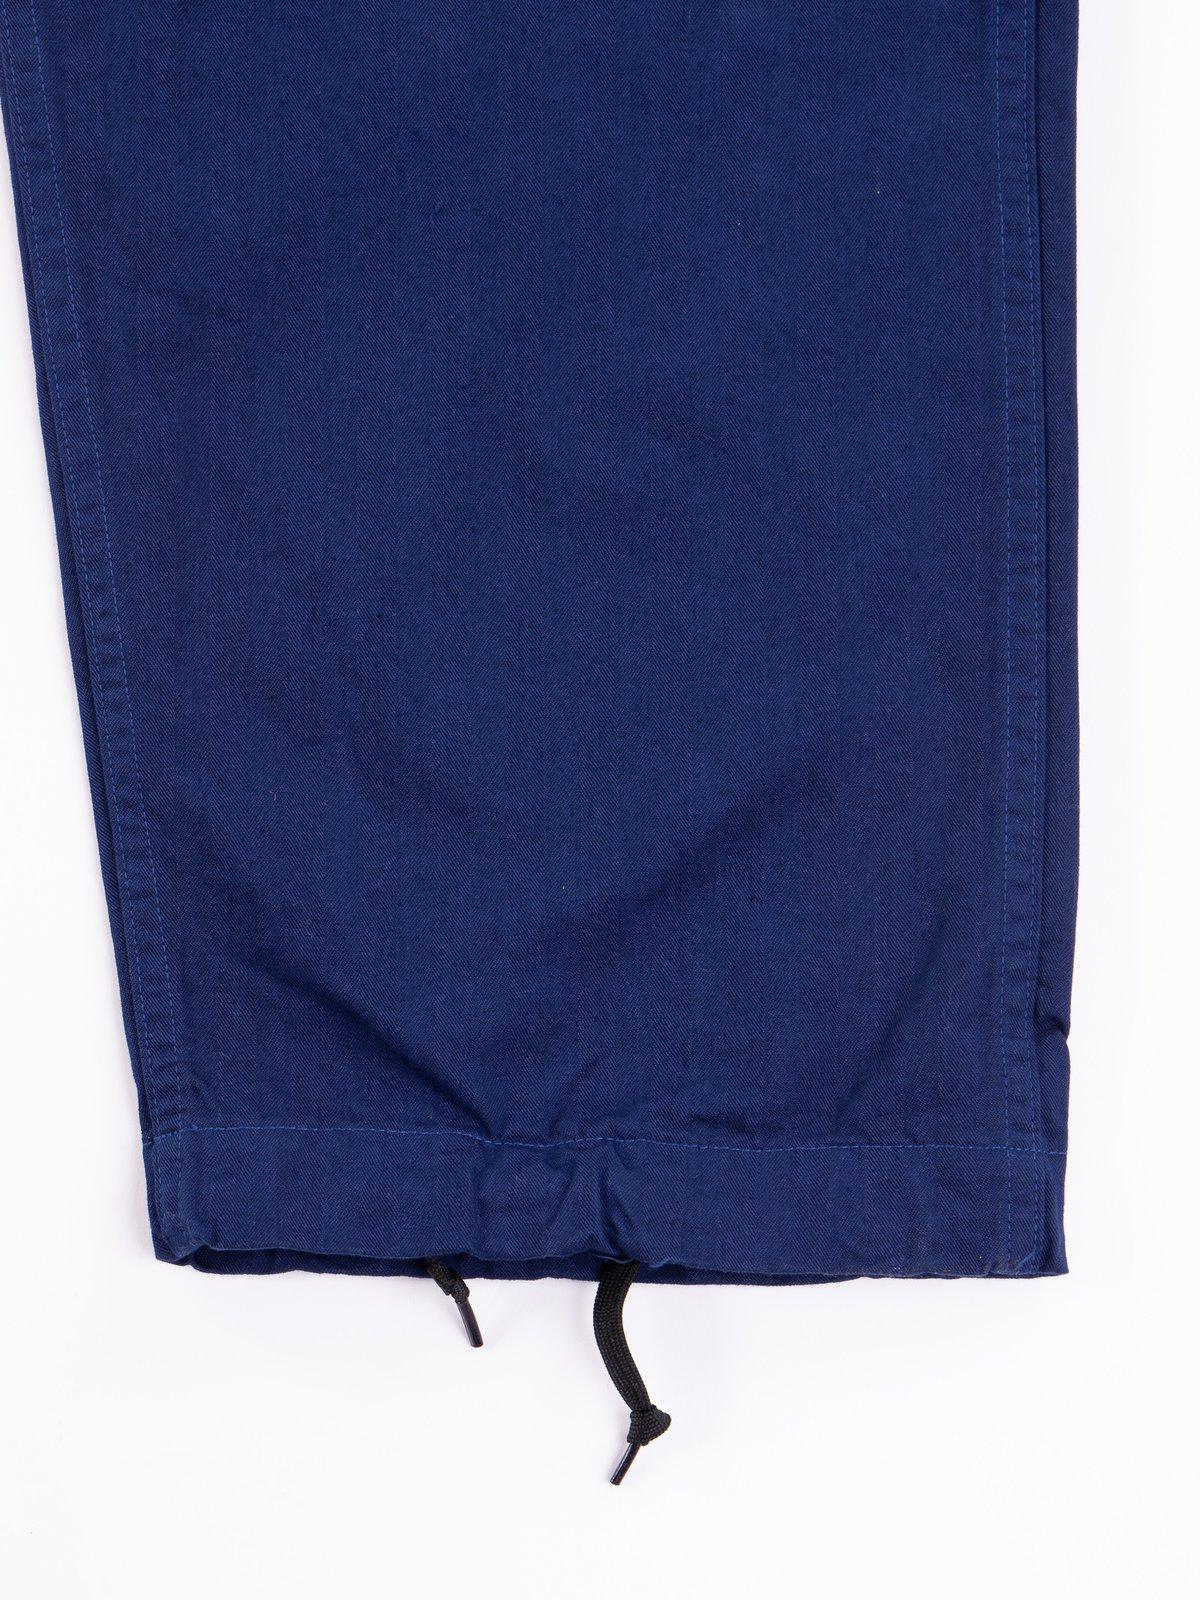 Ink Blue Herringbone TBB Service Pant - Image 5